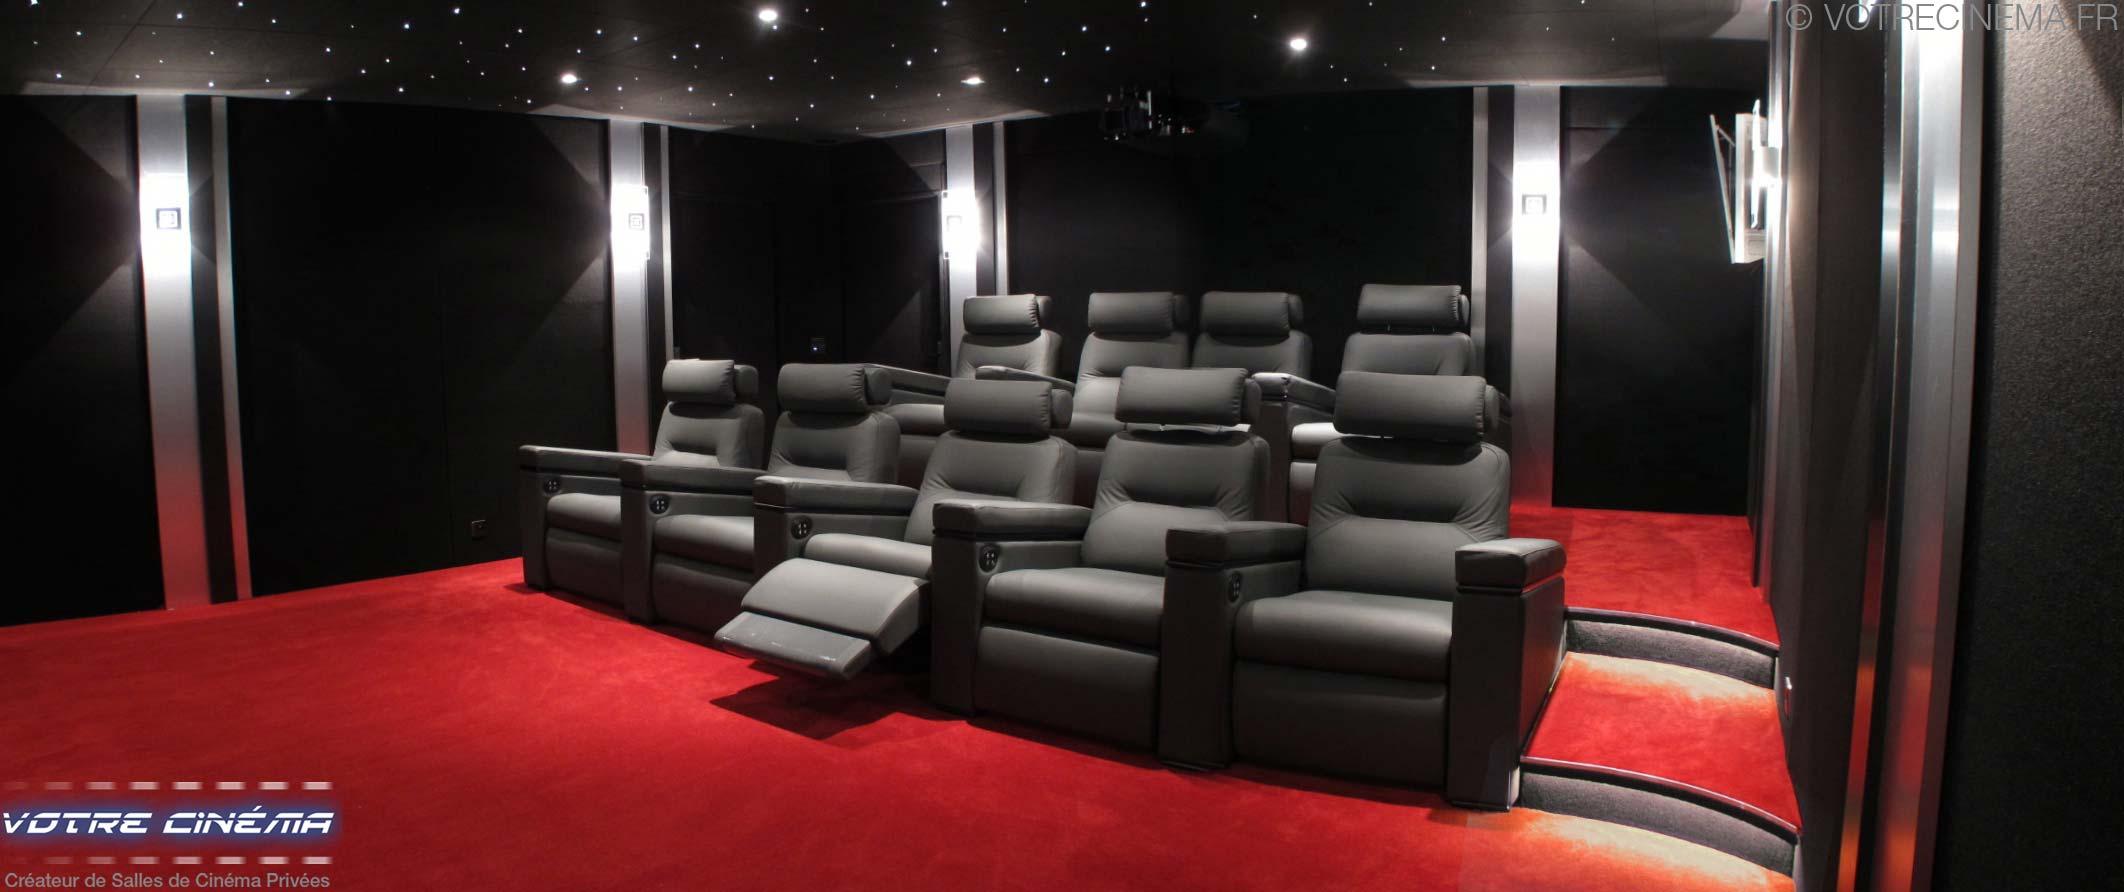 Lyon 40m Votre Cinema